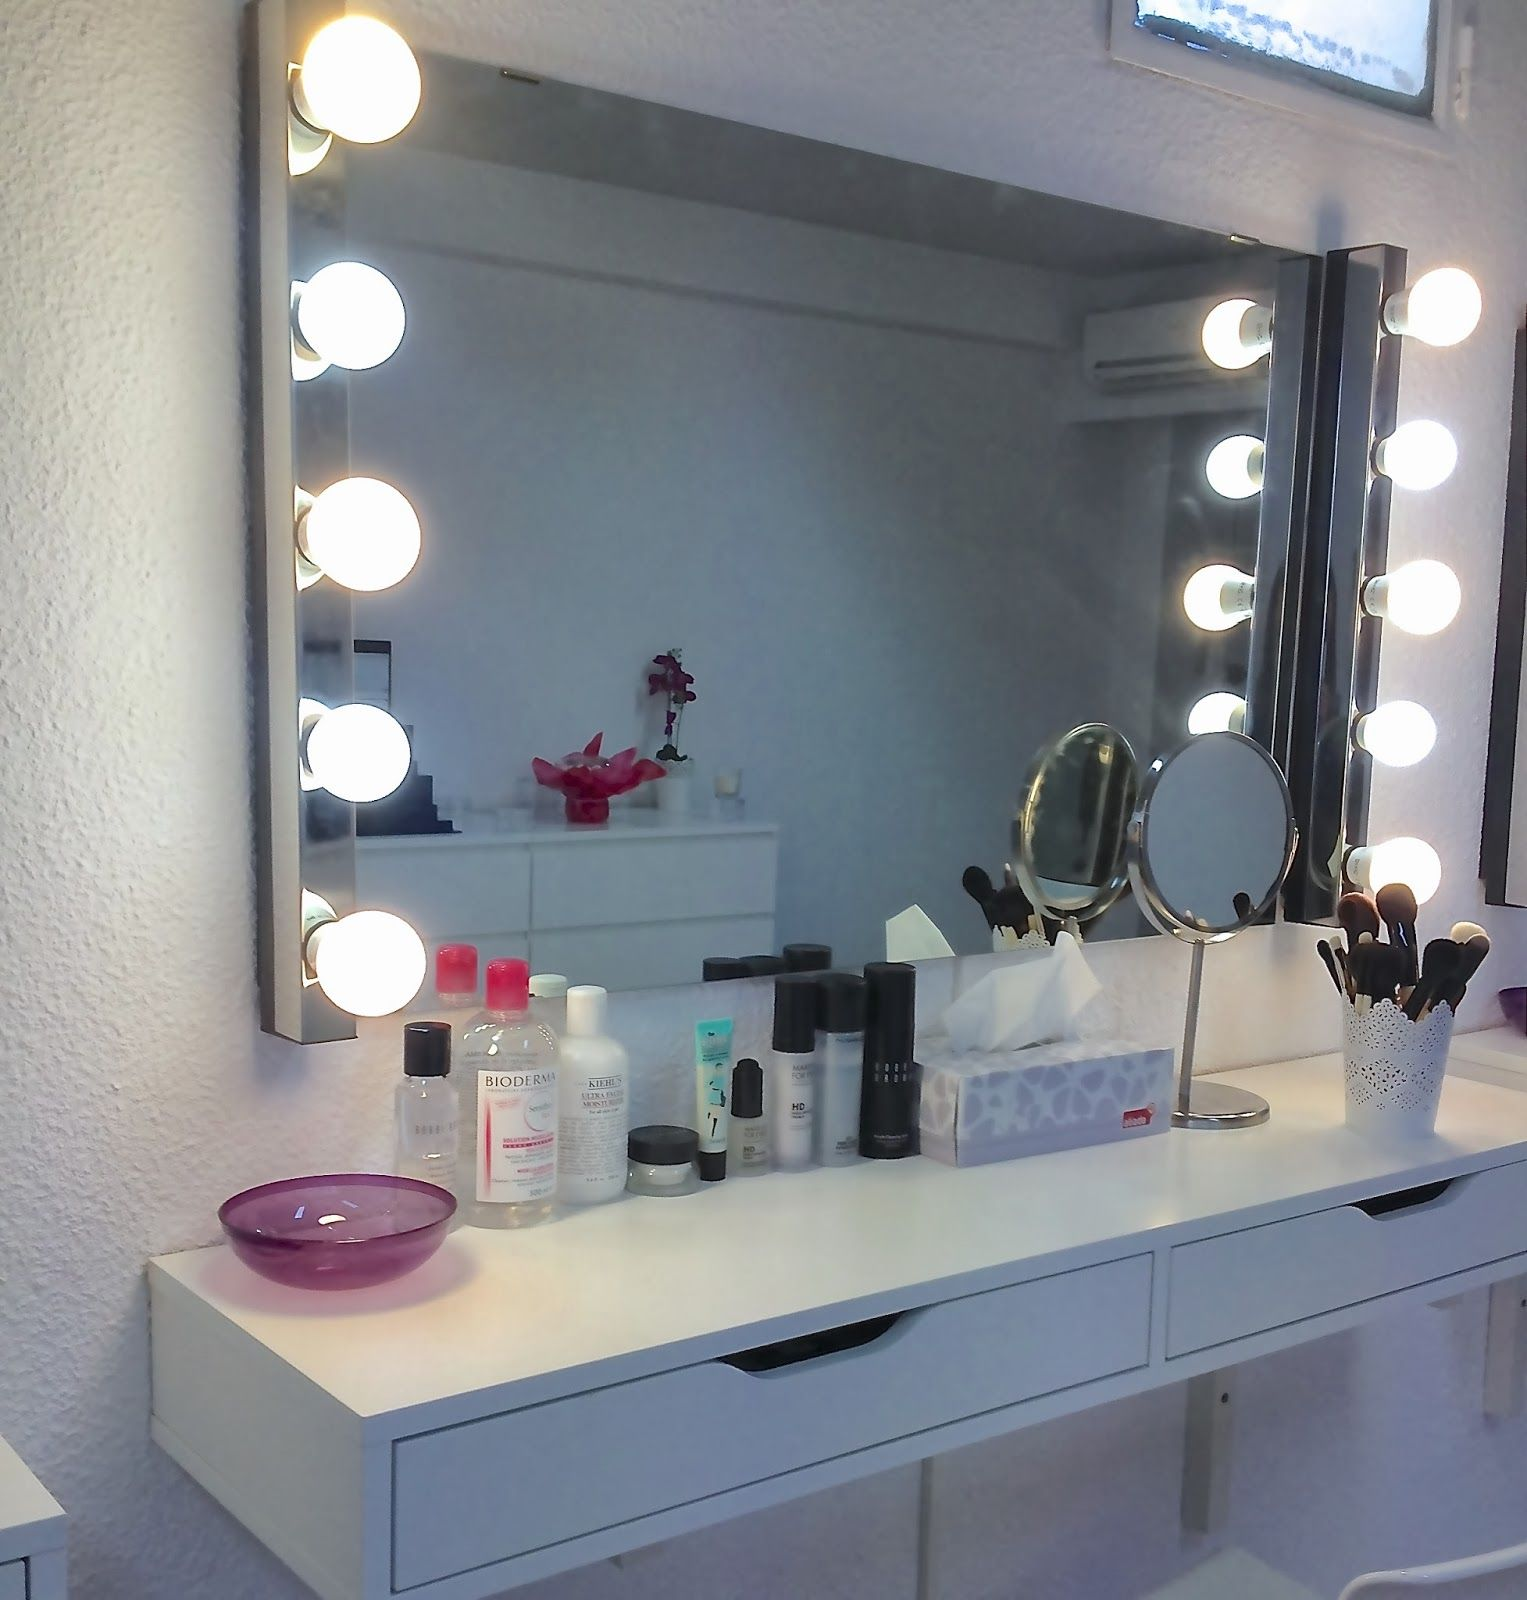 Aparichi makeup artist maquilladora profesional blog de for Mejores blogs decoracion